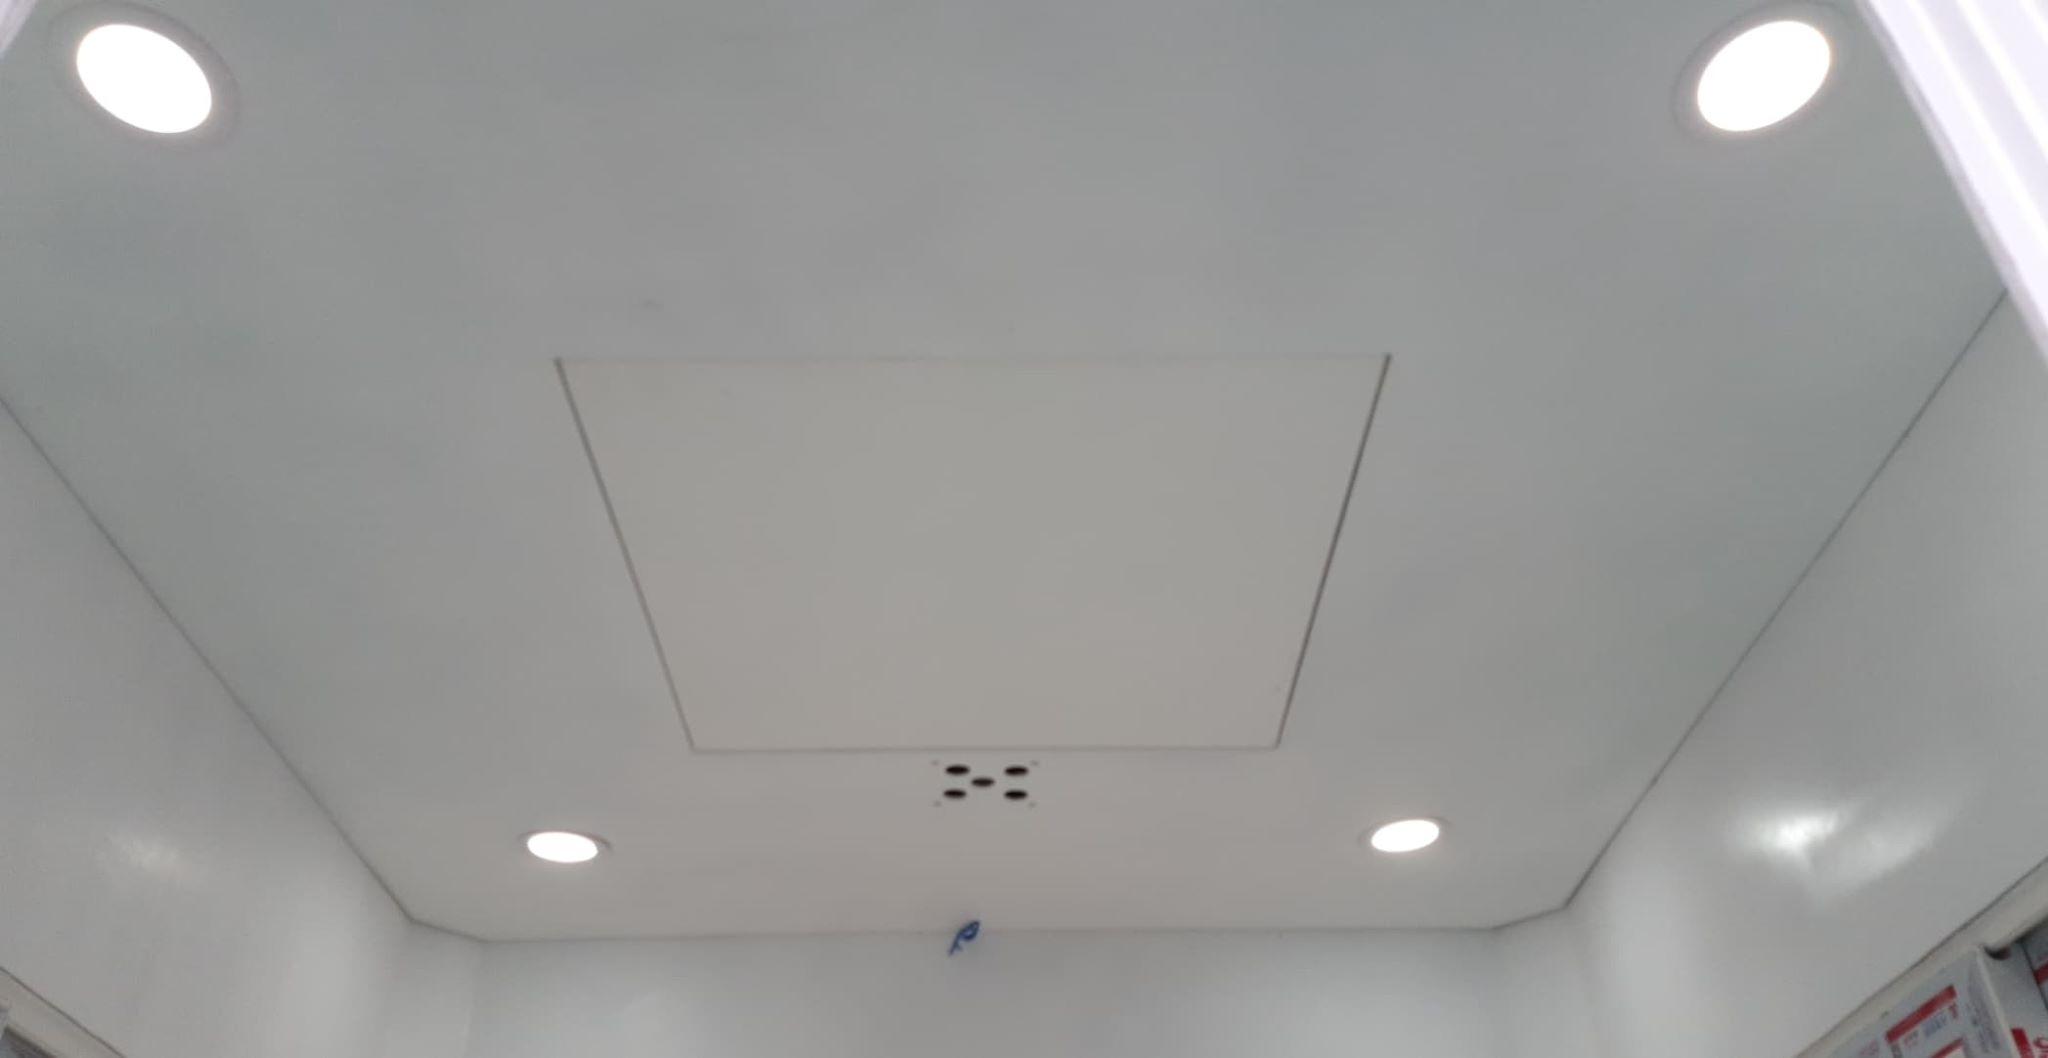 Trần composite gắn đèn dowlight 4 góc